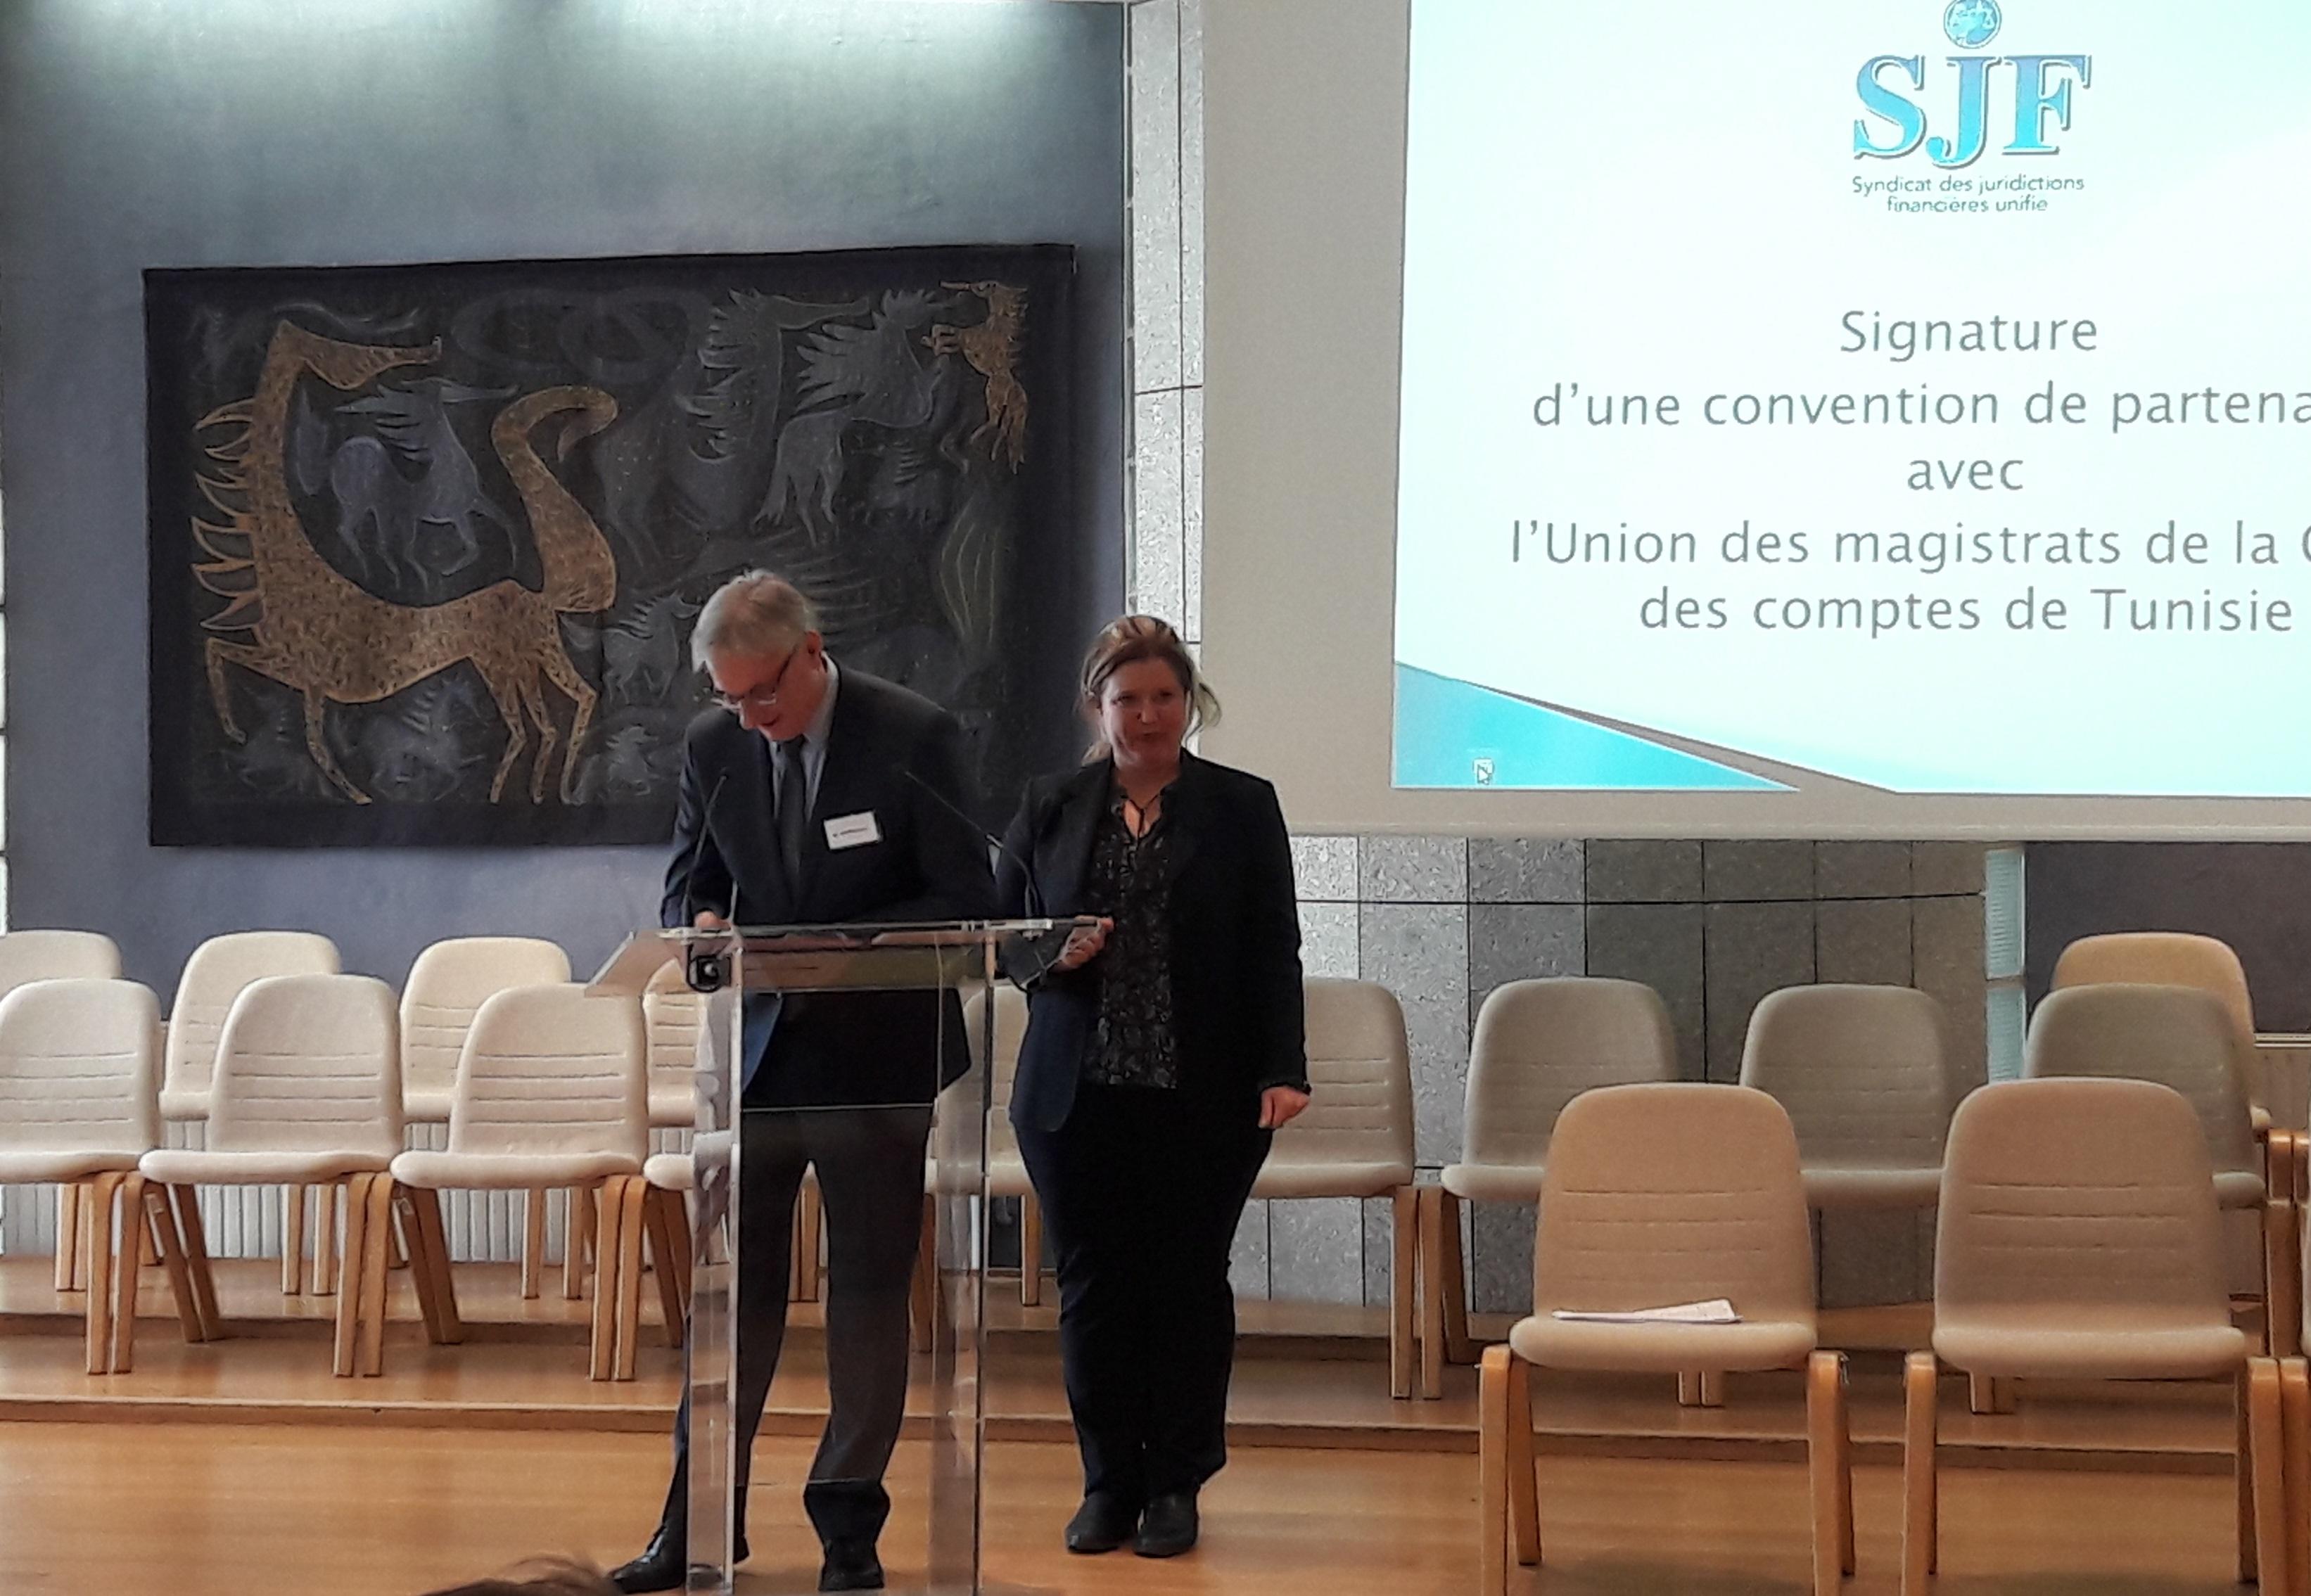 Signature de la convention de partenariat UMCC - SJFu